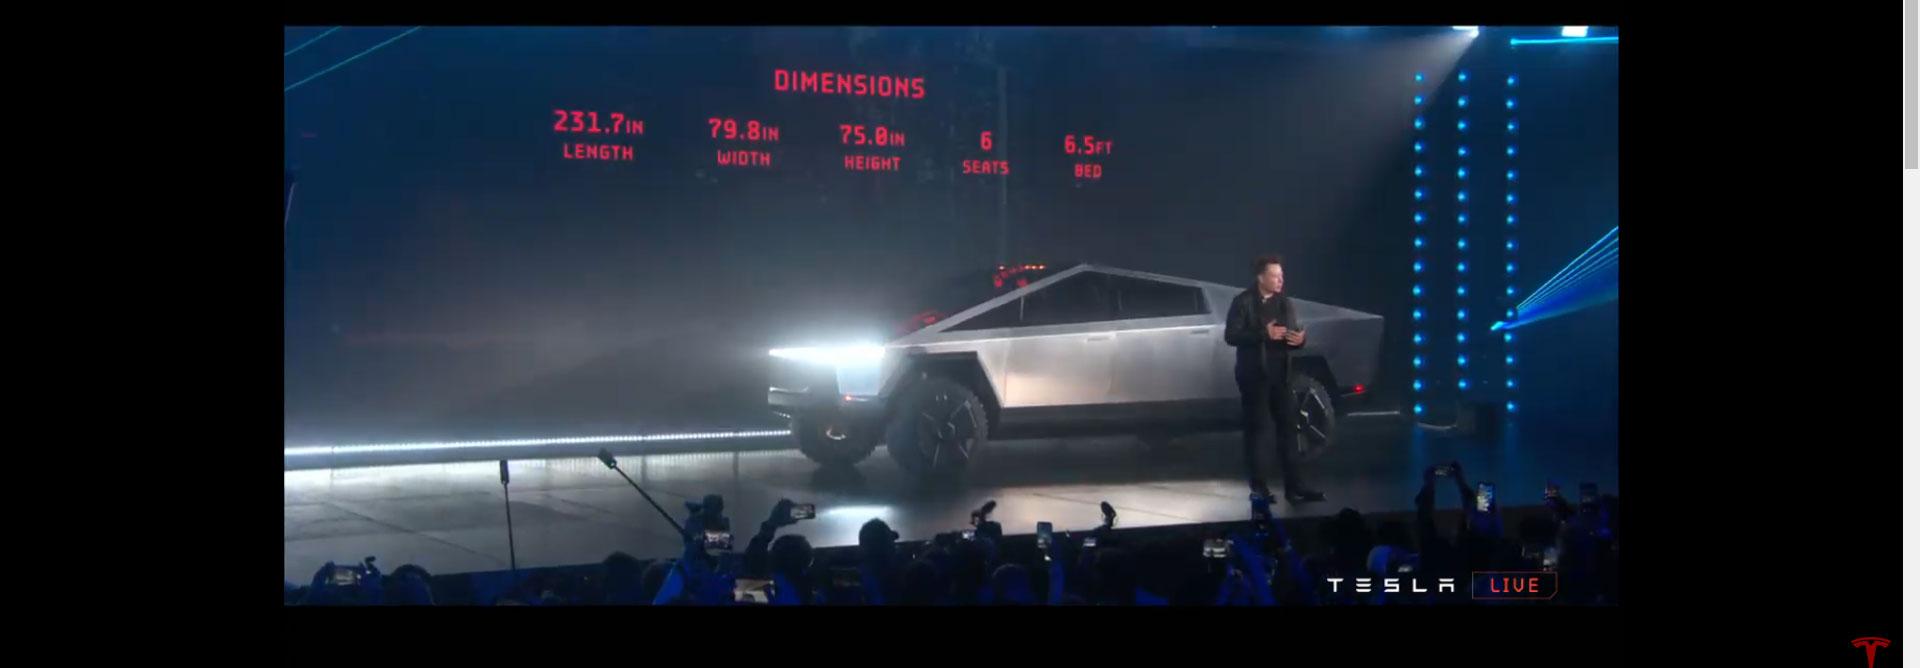 Tesla Cybertruck unveiling, Elon Musk revealing the truck's dimensions.